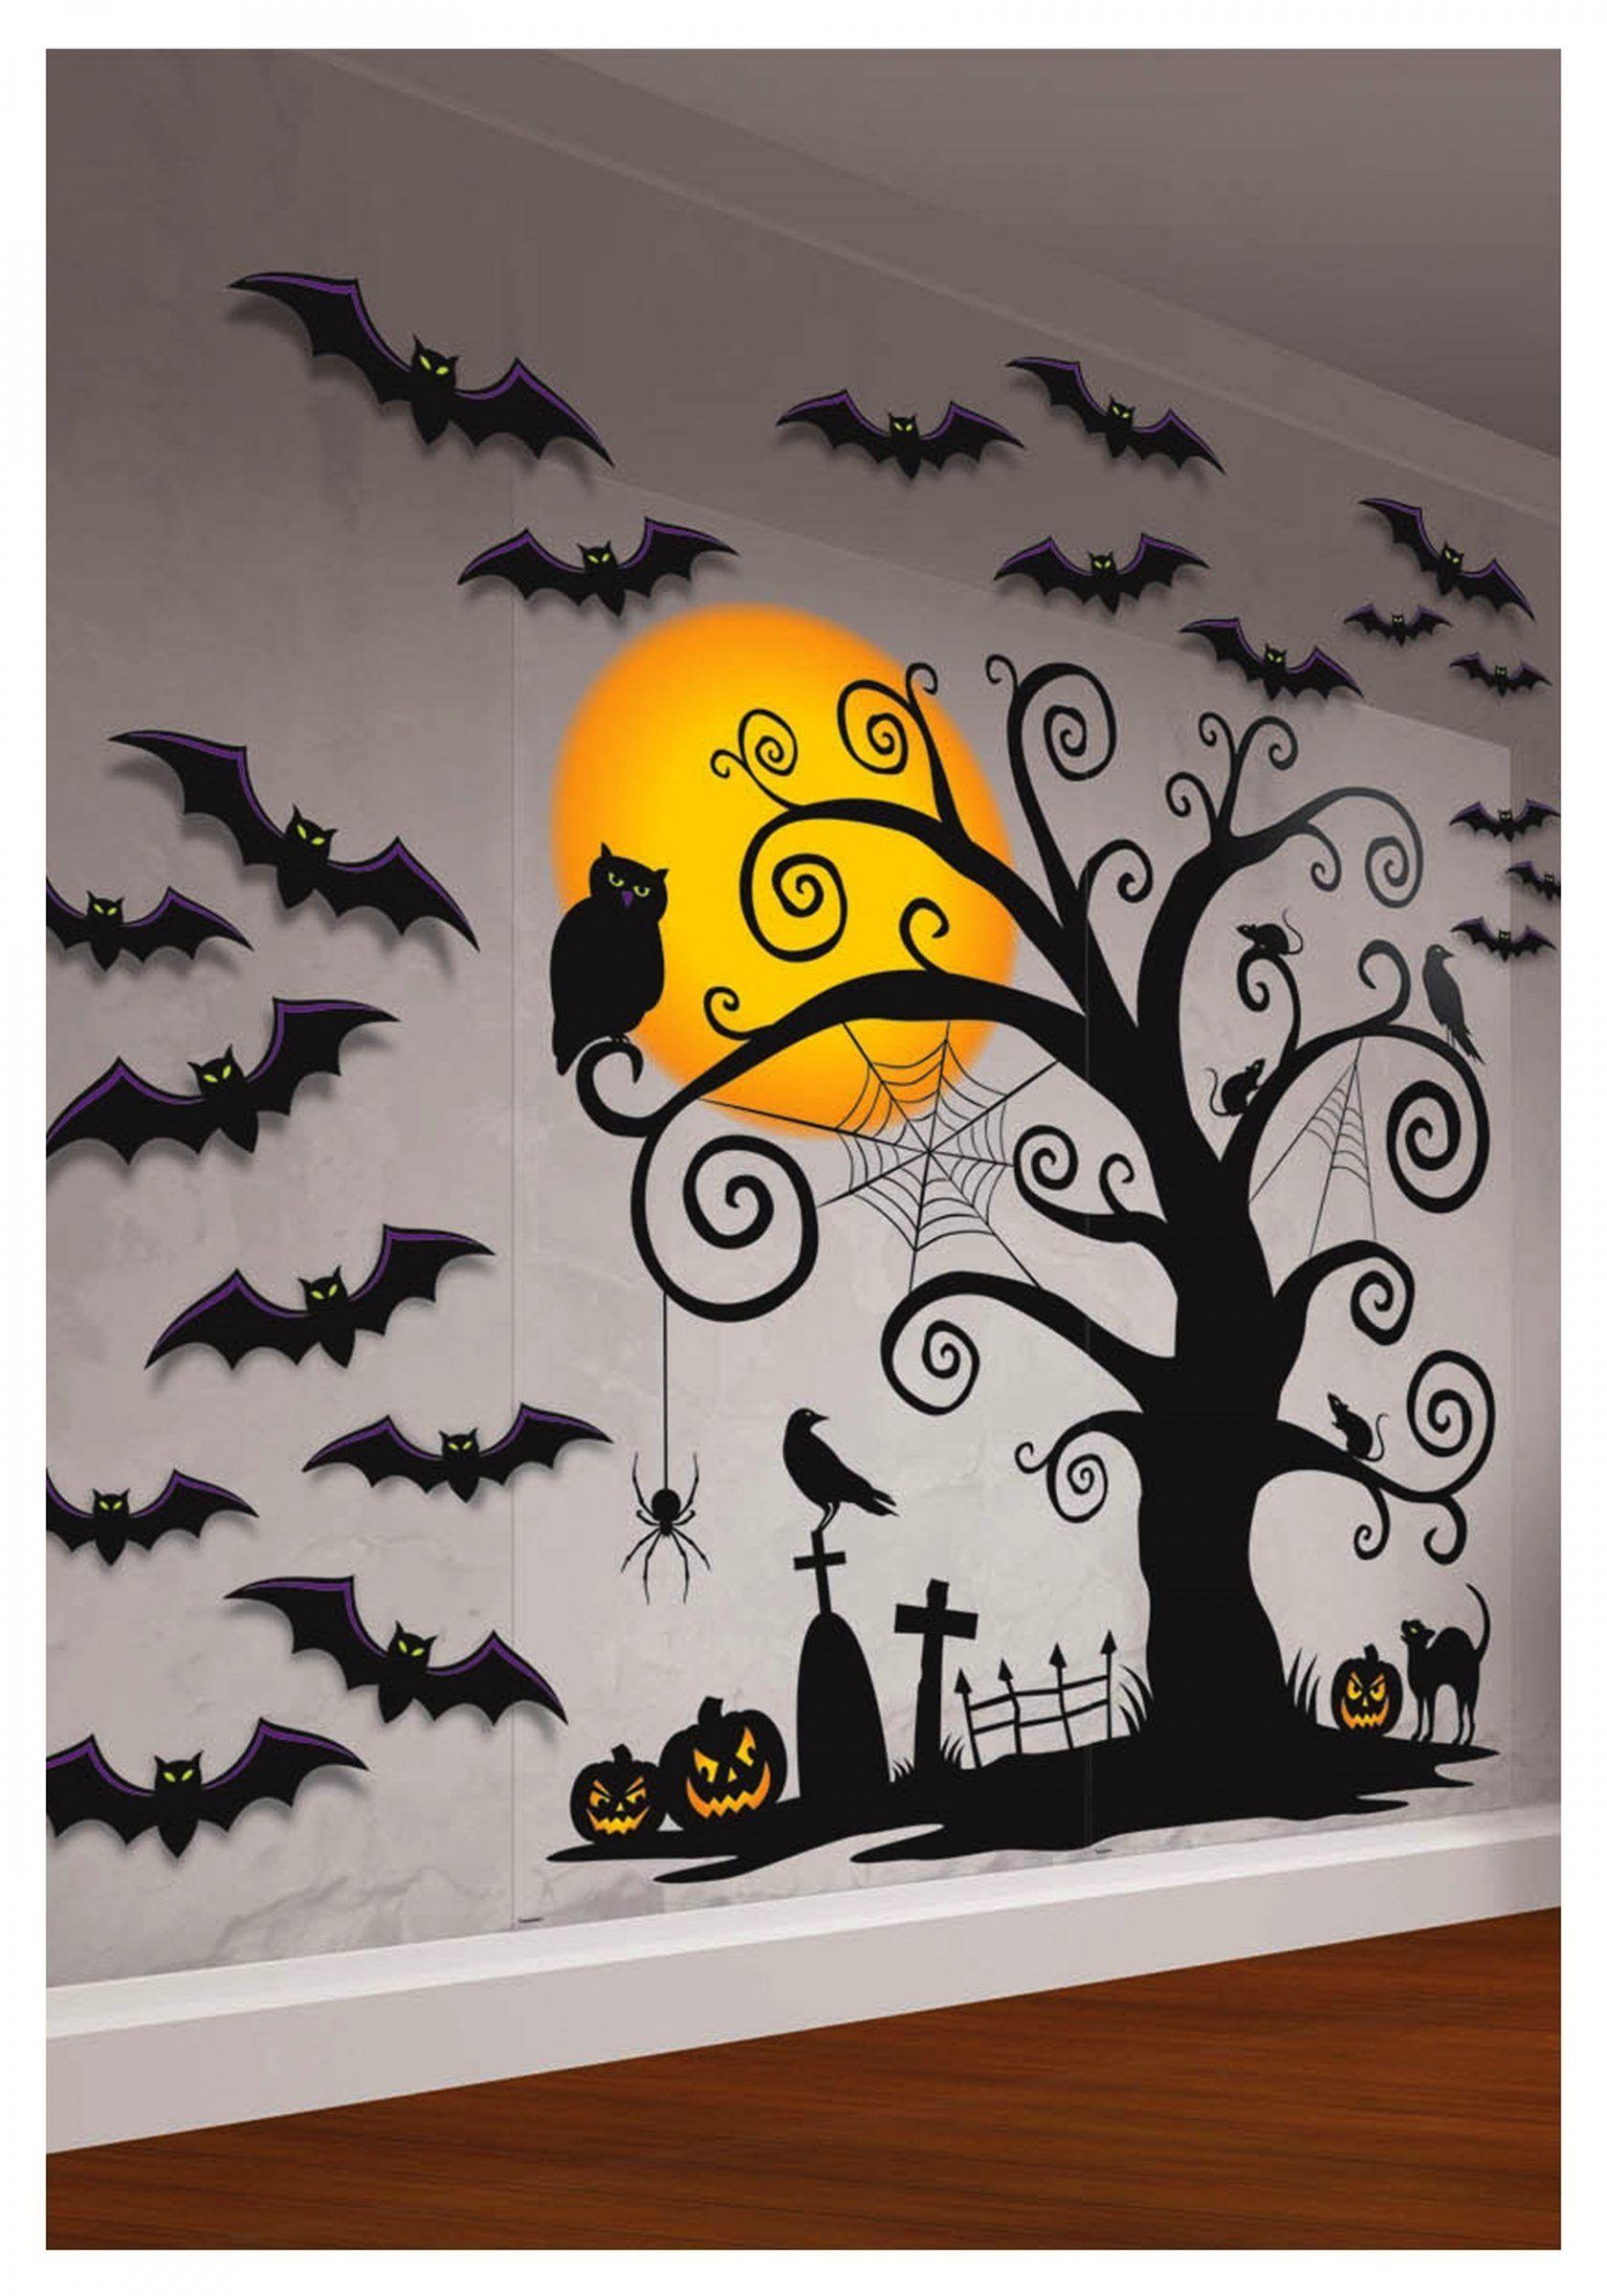 Phenomenon Interesting 25 Halloween Home Wall Decorating Ideas To Inspire Yo Halloween Wall Decor Halloween Decorations Indoor Halloween Classroom Decorations